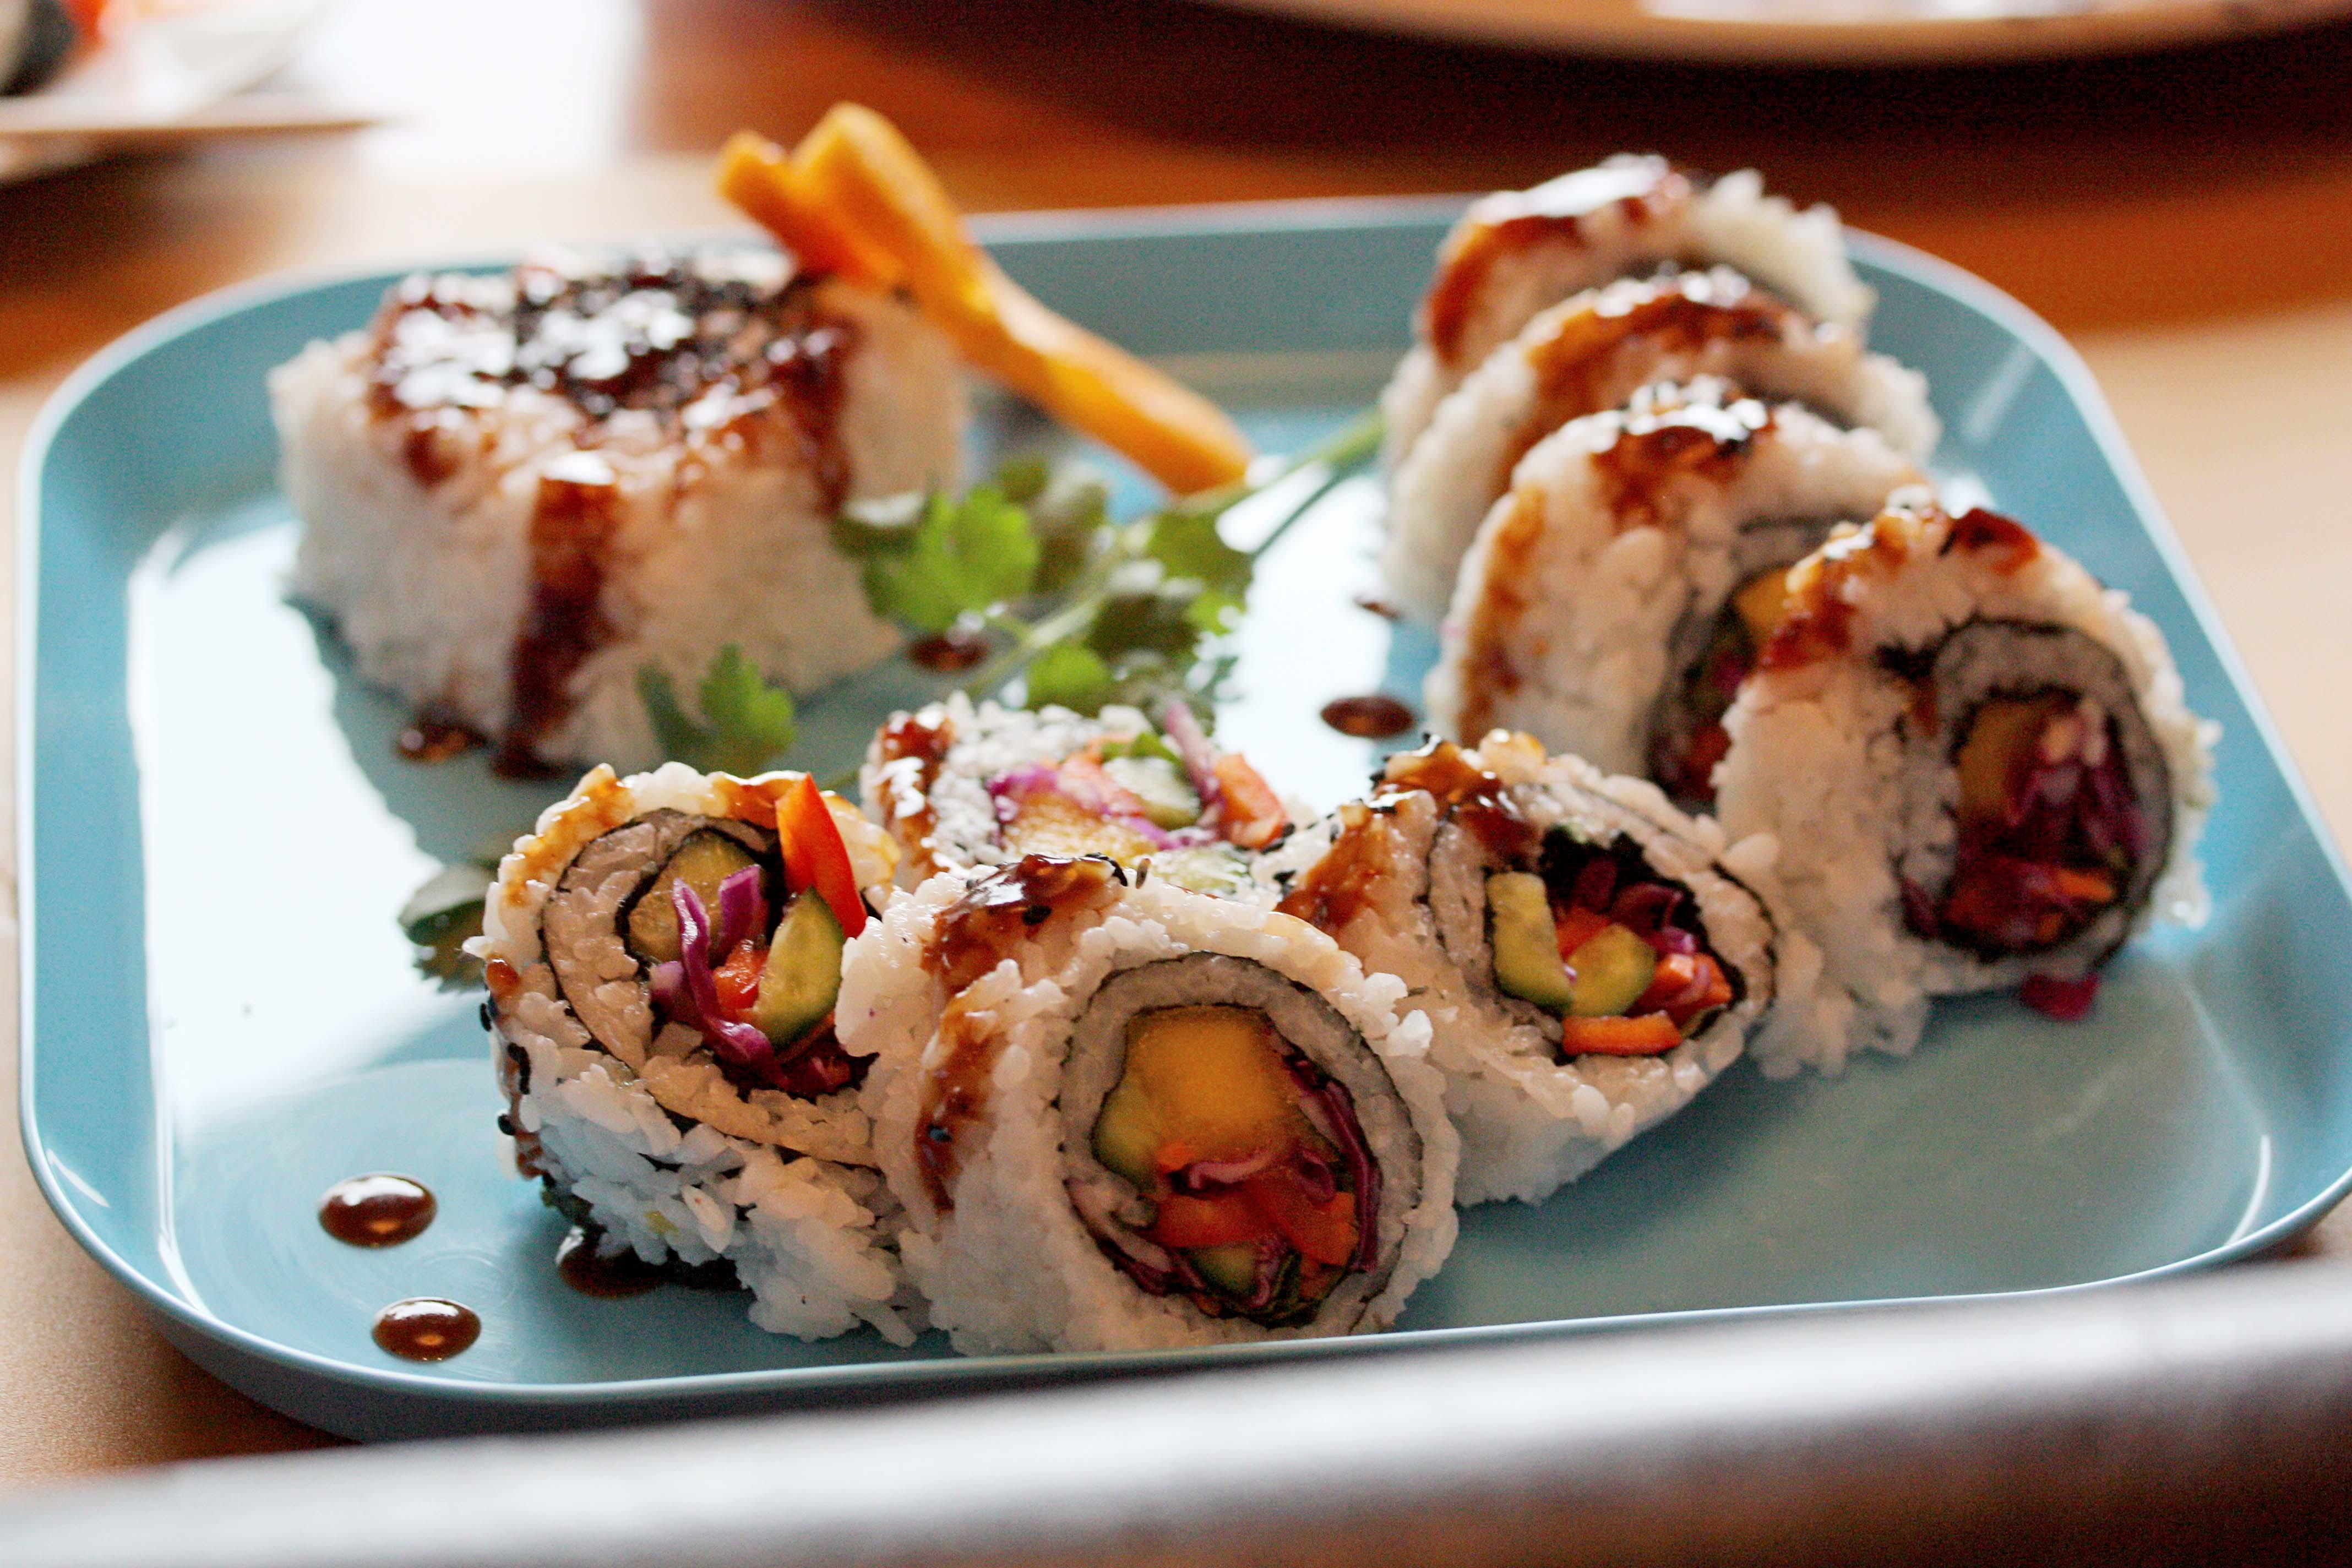 gluten-free, vegan, sushi class, online, Julie Hasson